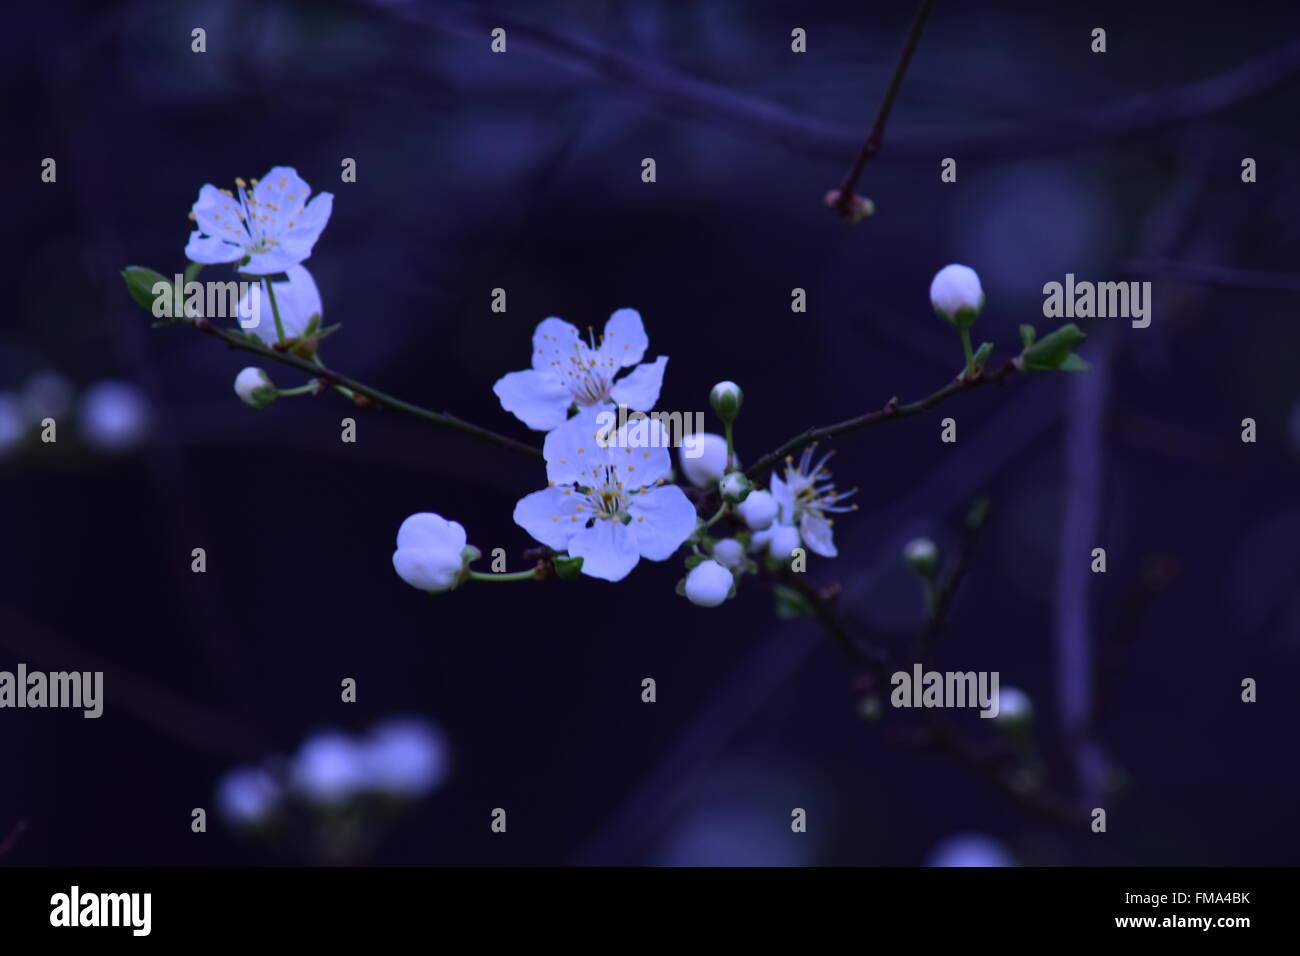 plump - Stock Image